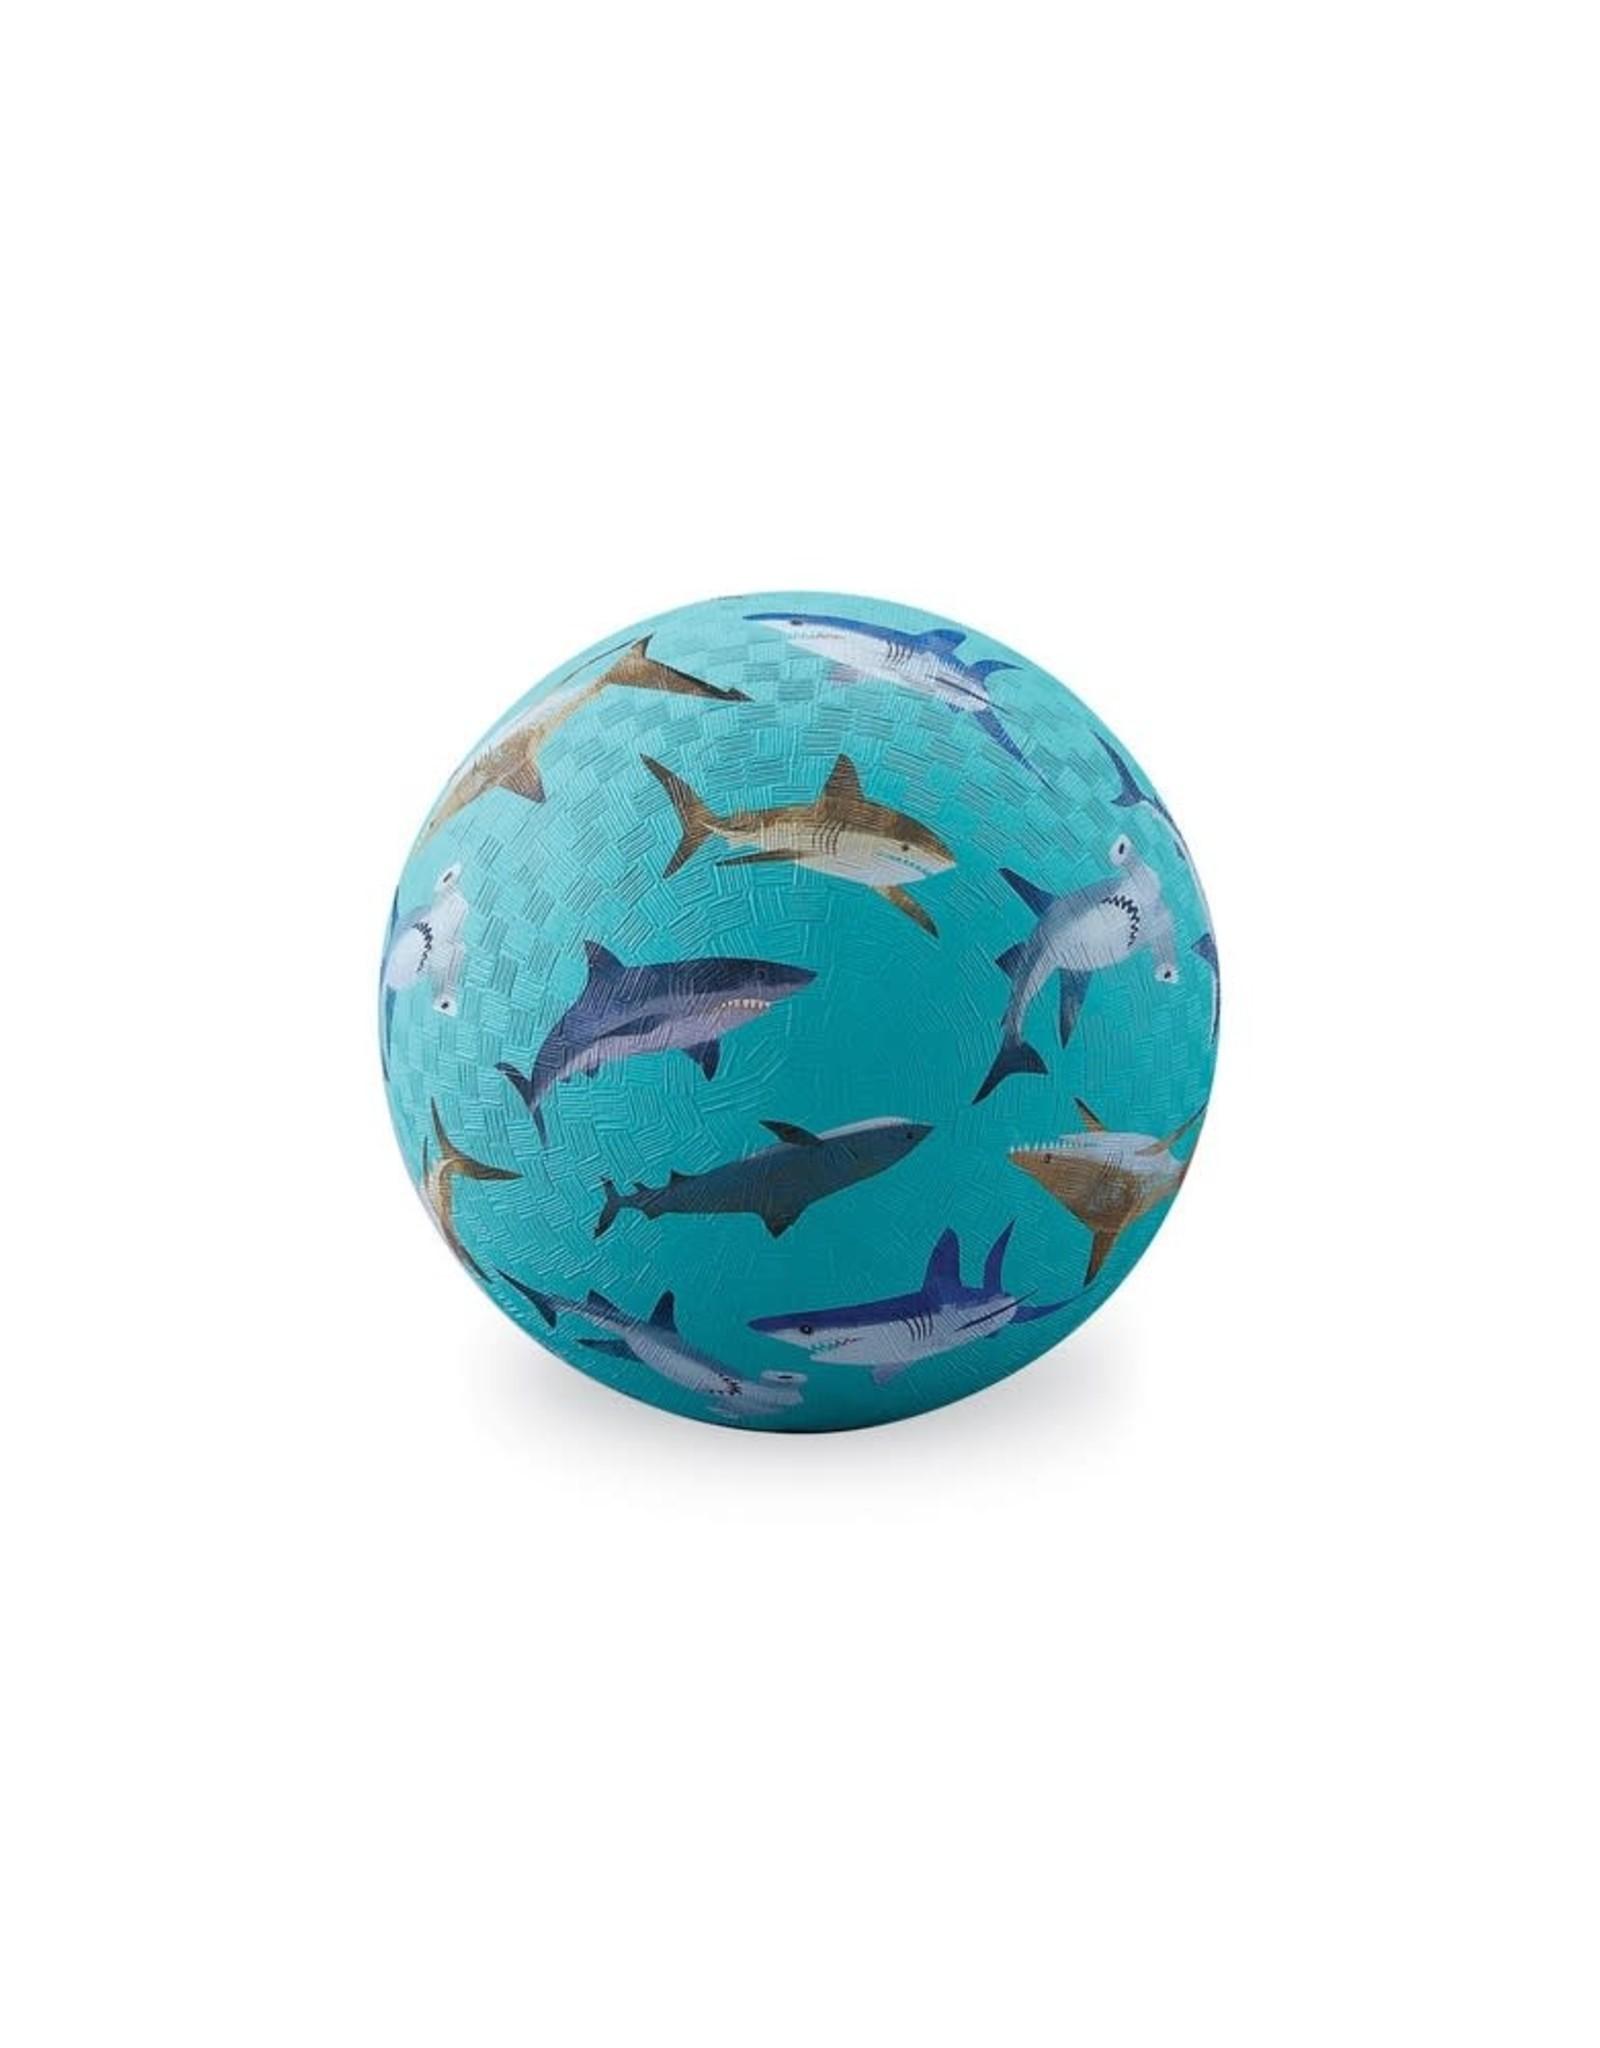 "Crocodile Creek 7"" Playball - Sharks"